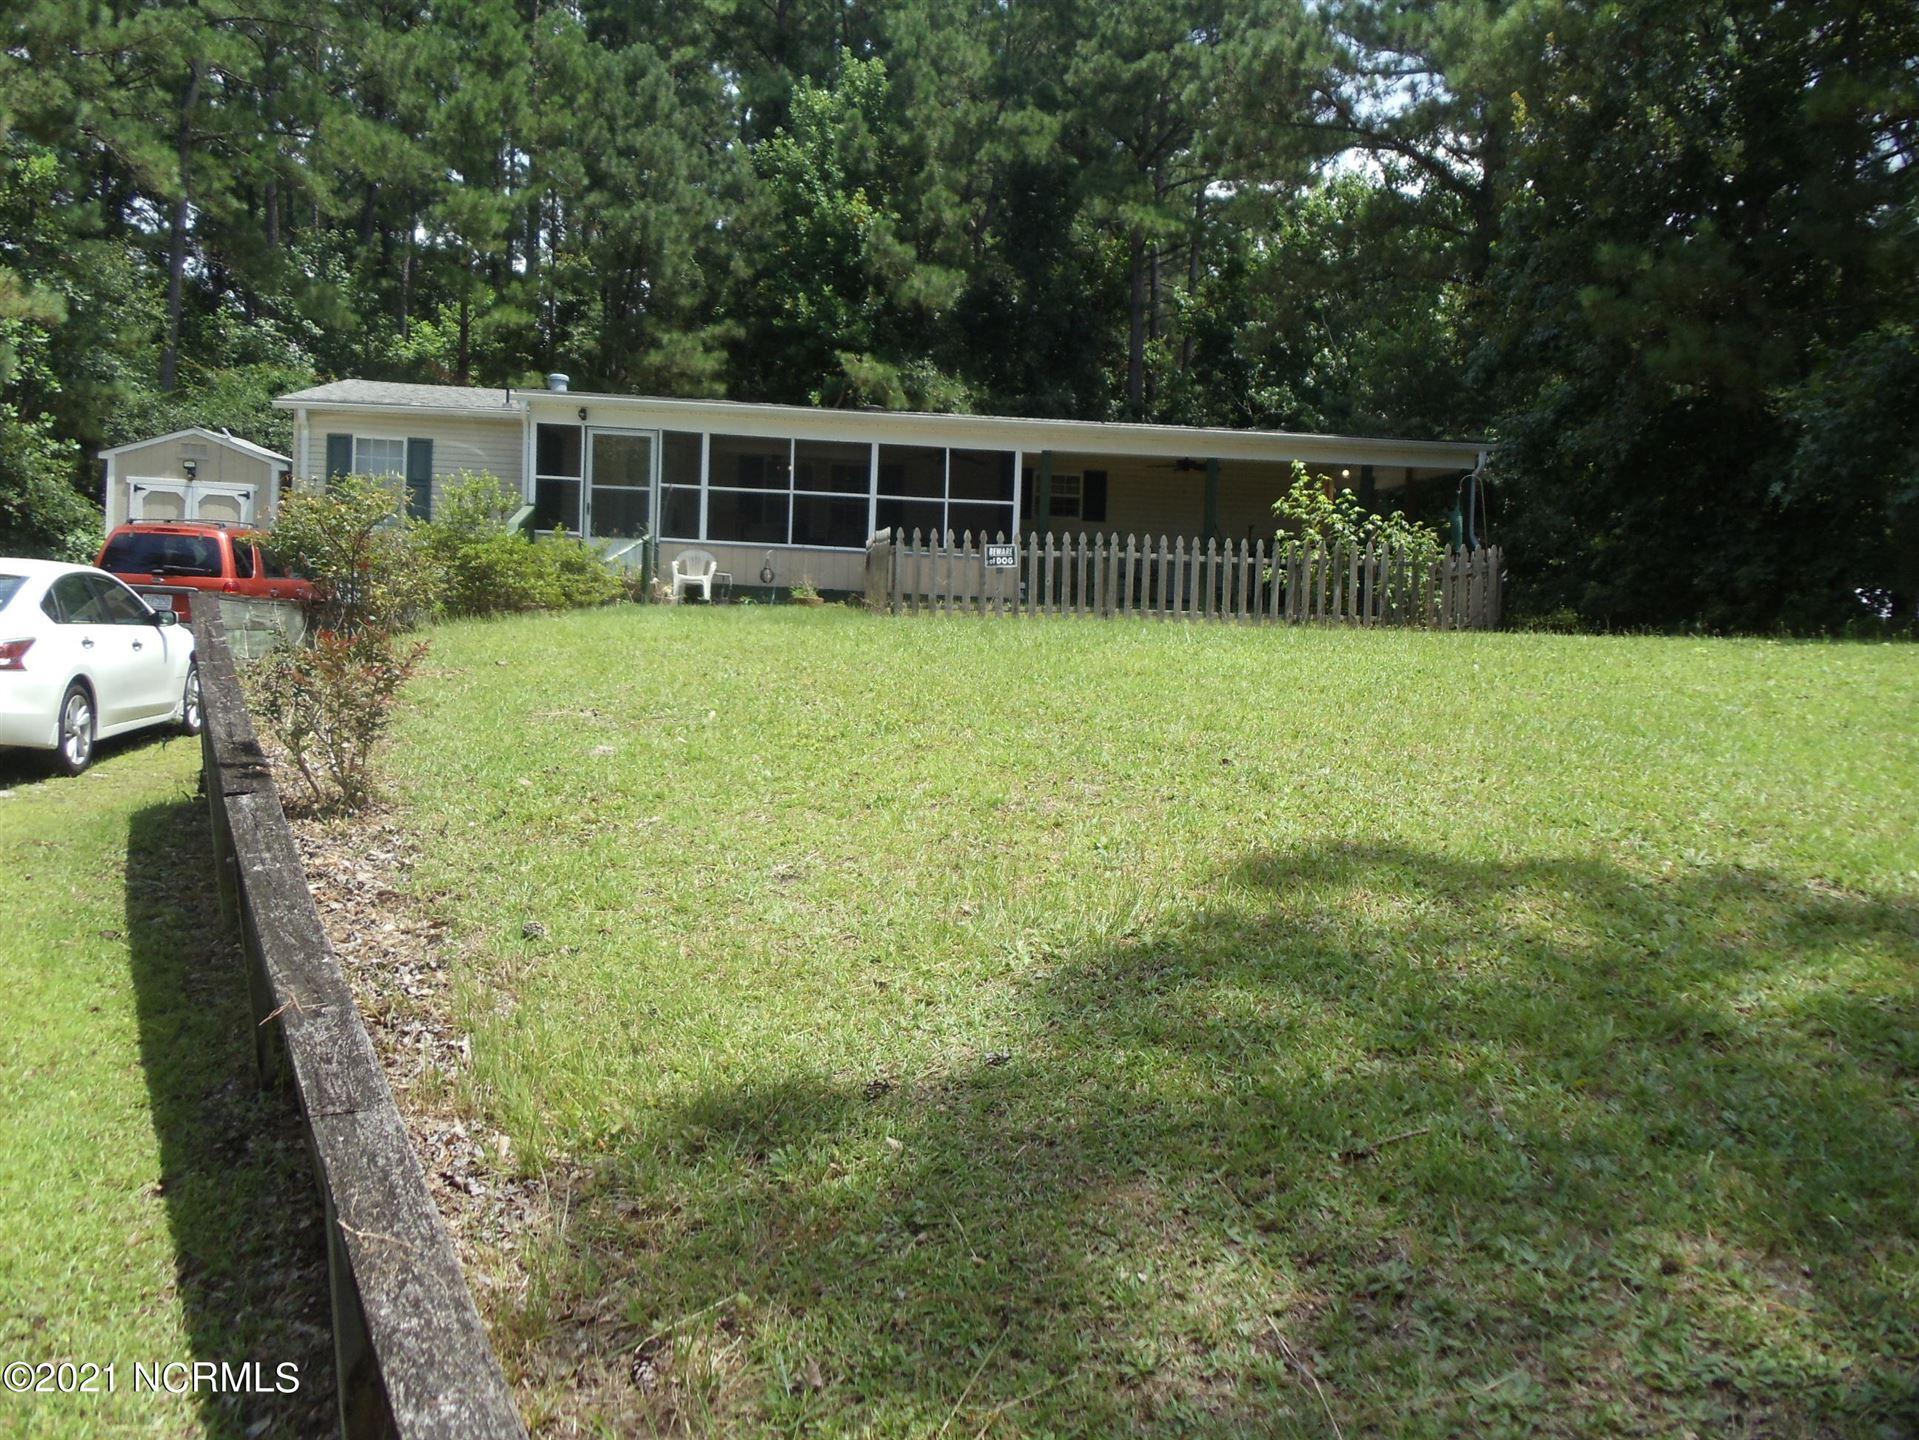 Photo of 562 Riggs Road, Hubert, NC 28539 (MLS # 100283261)